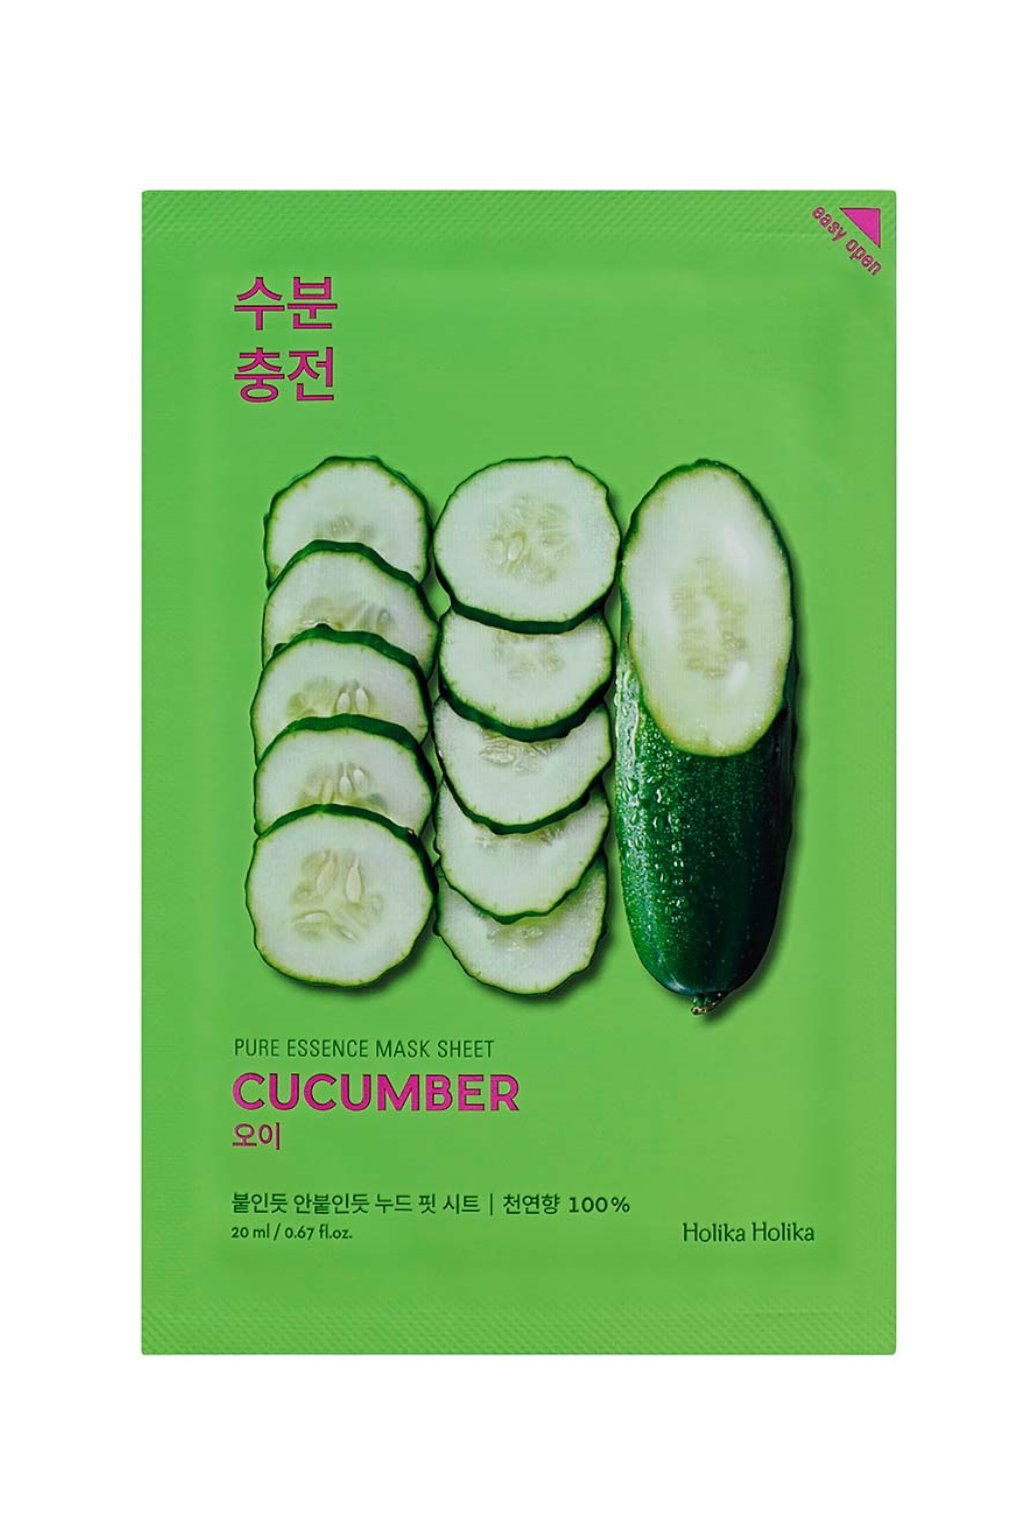 Holika Holika Pure Essence Cucumber Mask